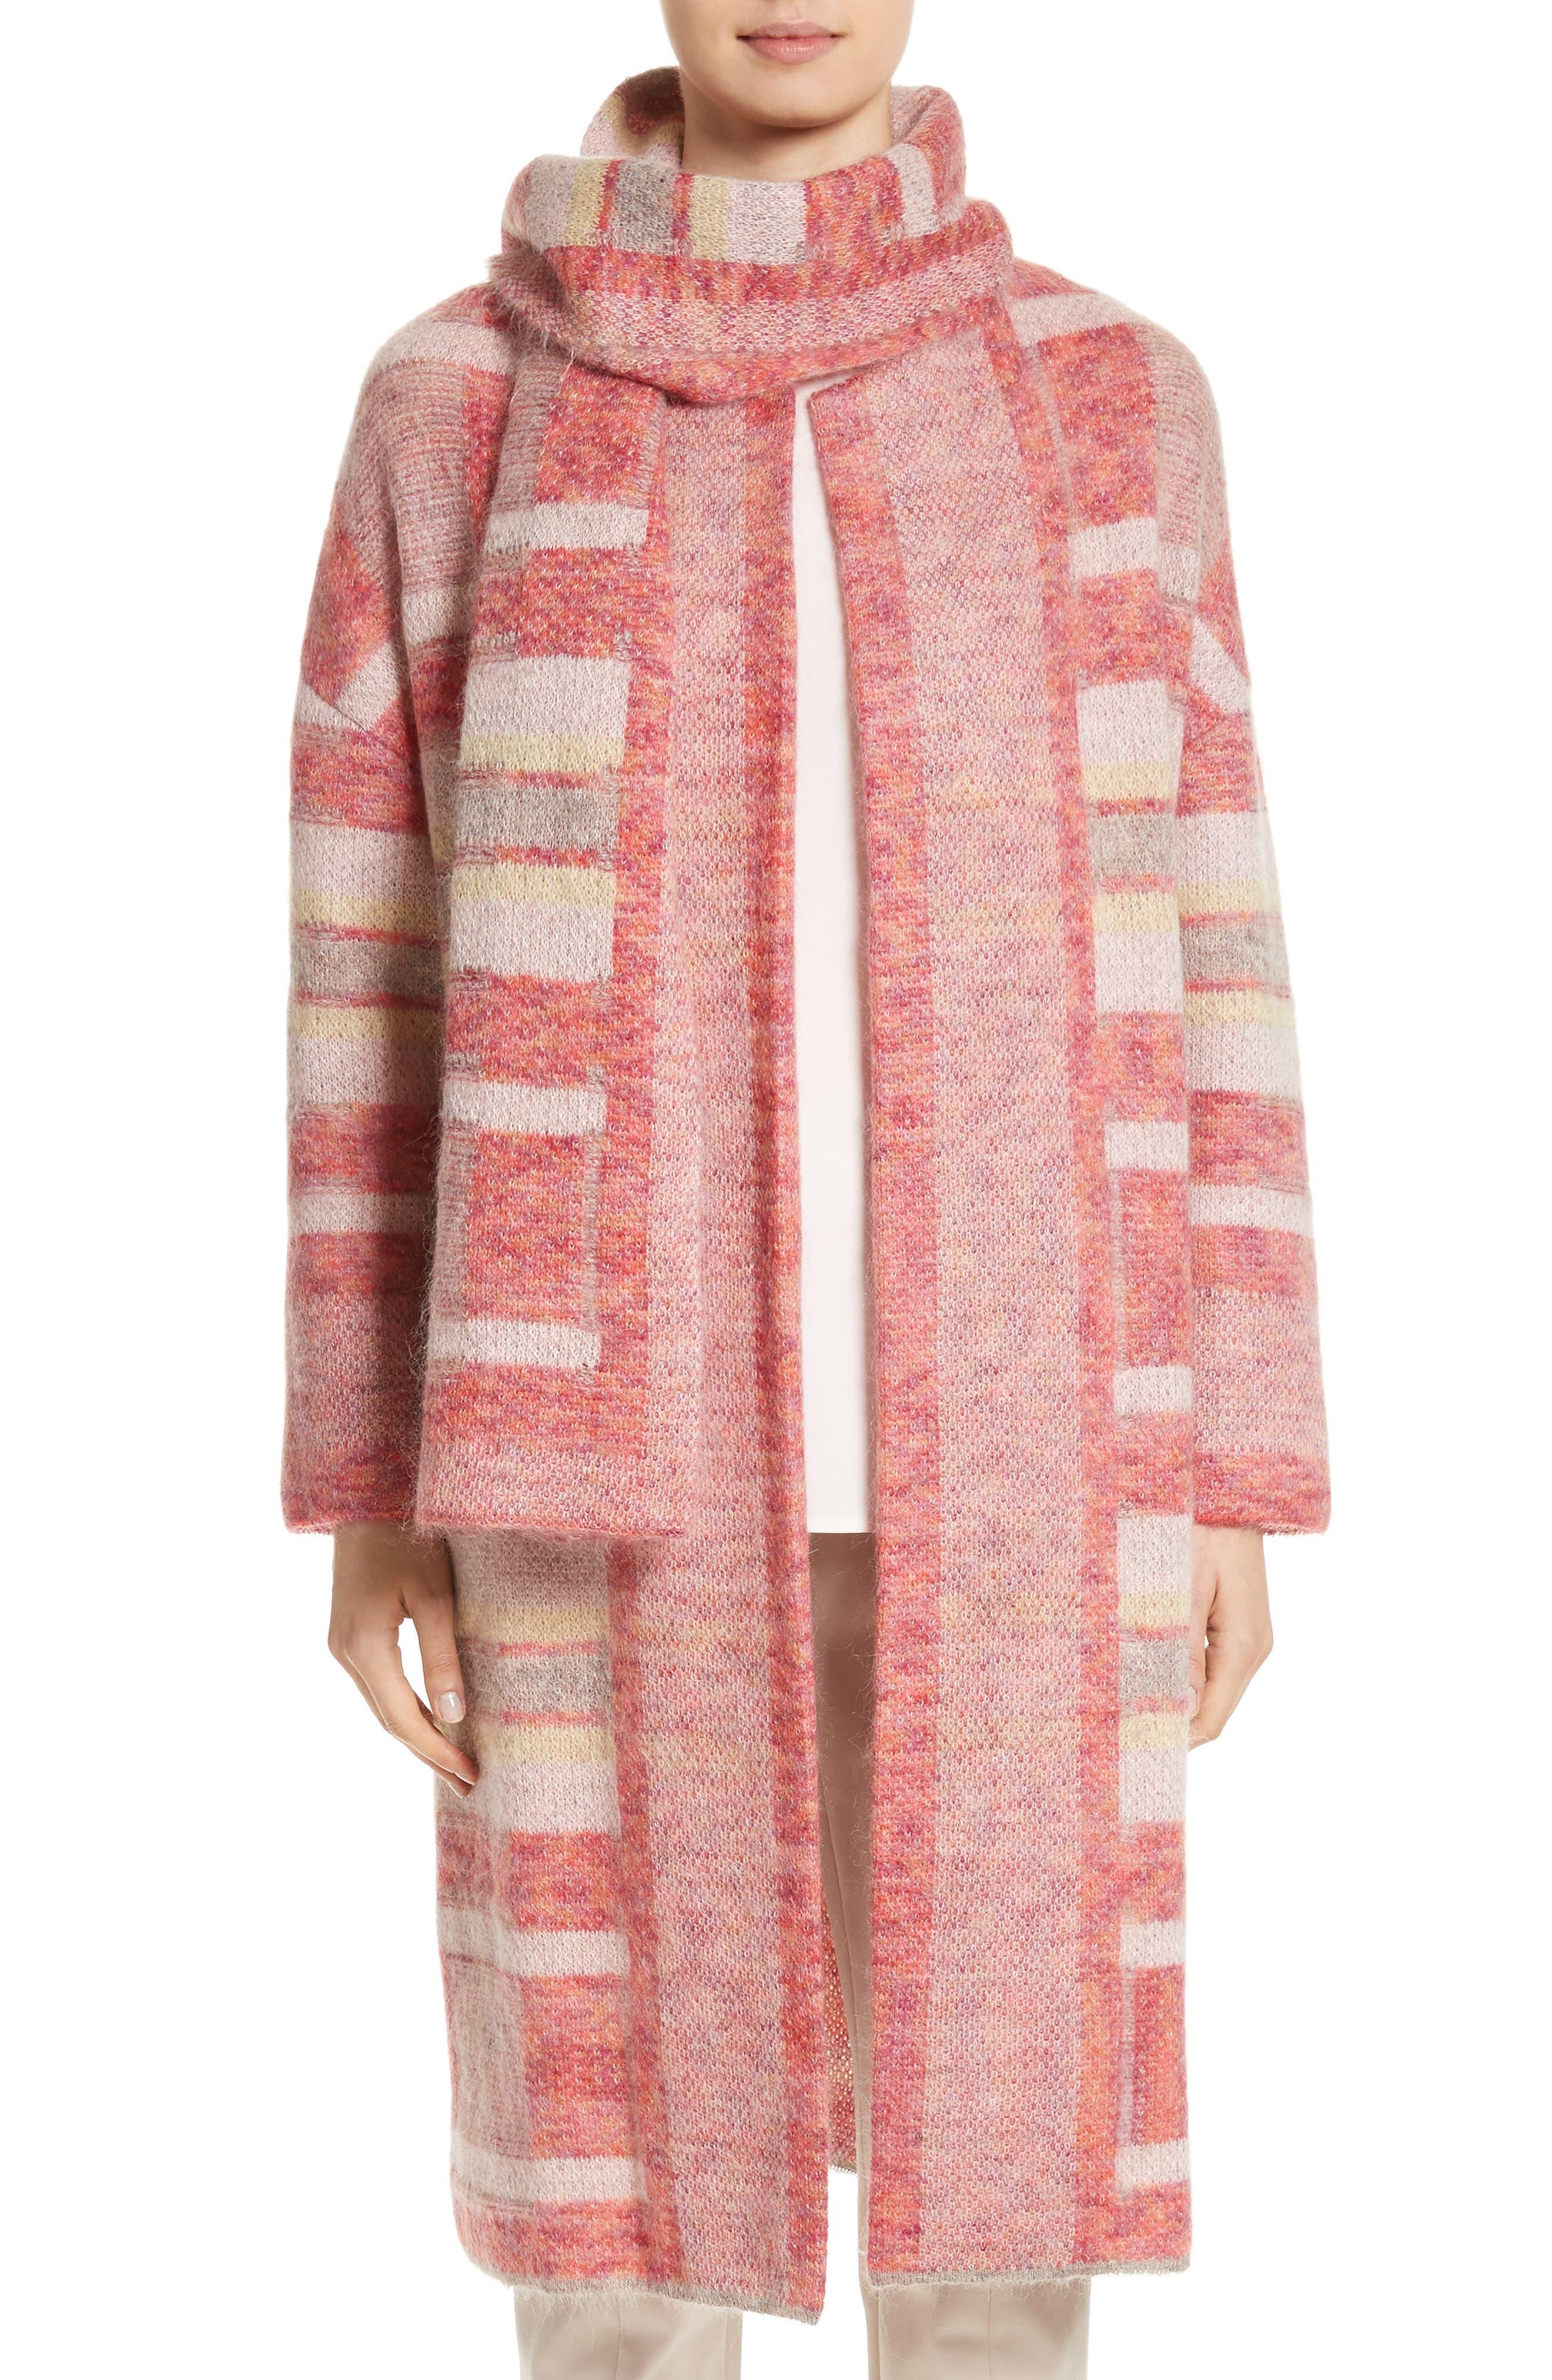 Lofty Knit Plaid Blanket Coat,                         Main,                         color, Bright Coral Multi